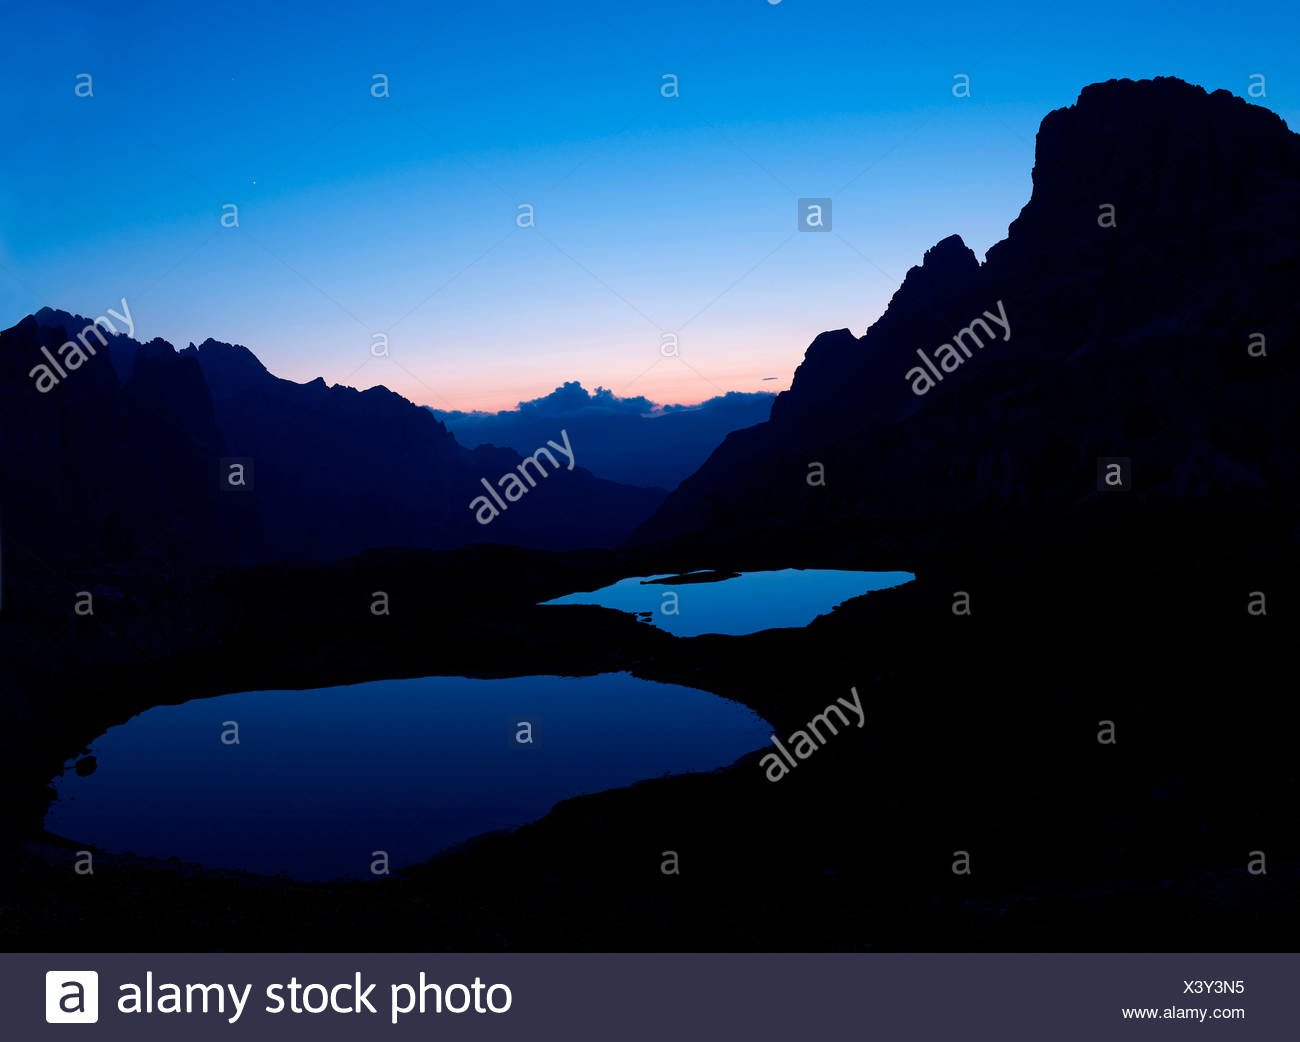 Boedenseen lakes at dawn, Dolomiti di Sesto National Park, Sexten Dolomites, Dolomites, province of Bolzano-Bozen, Italy, Europe - Stock Image